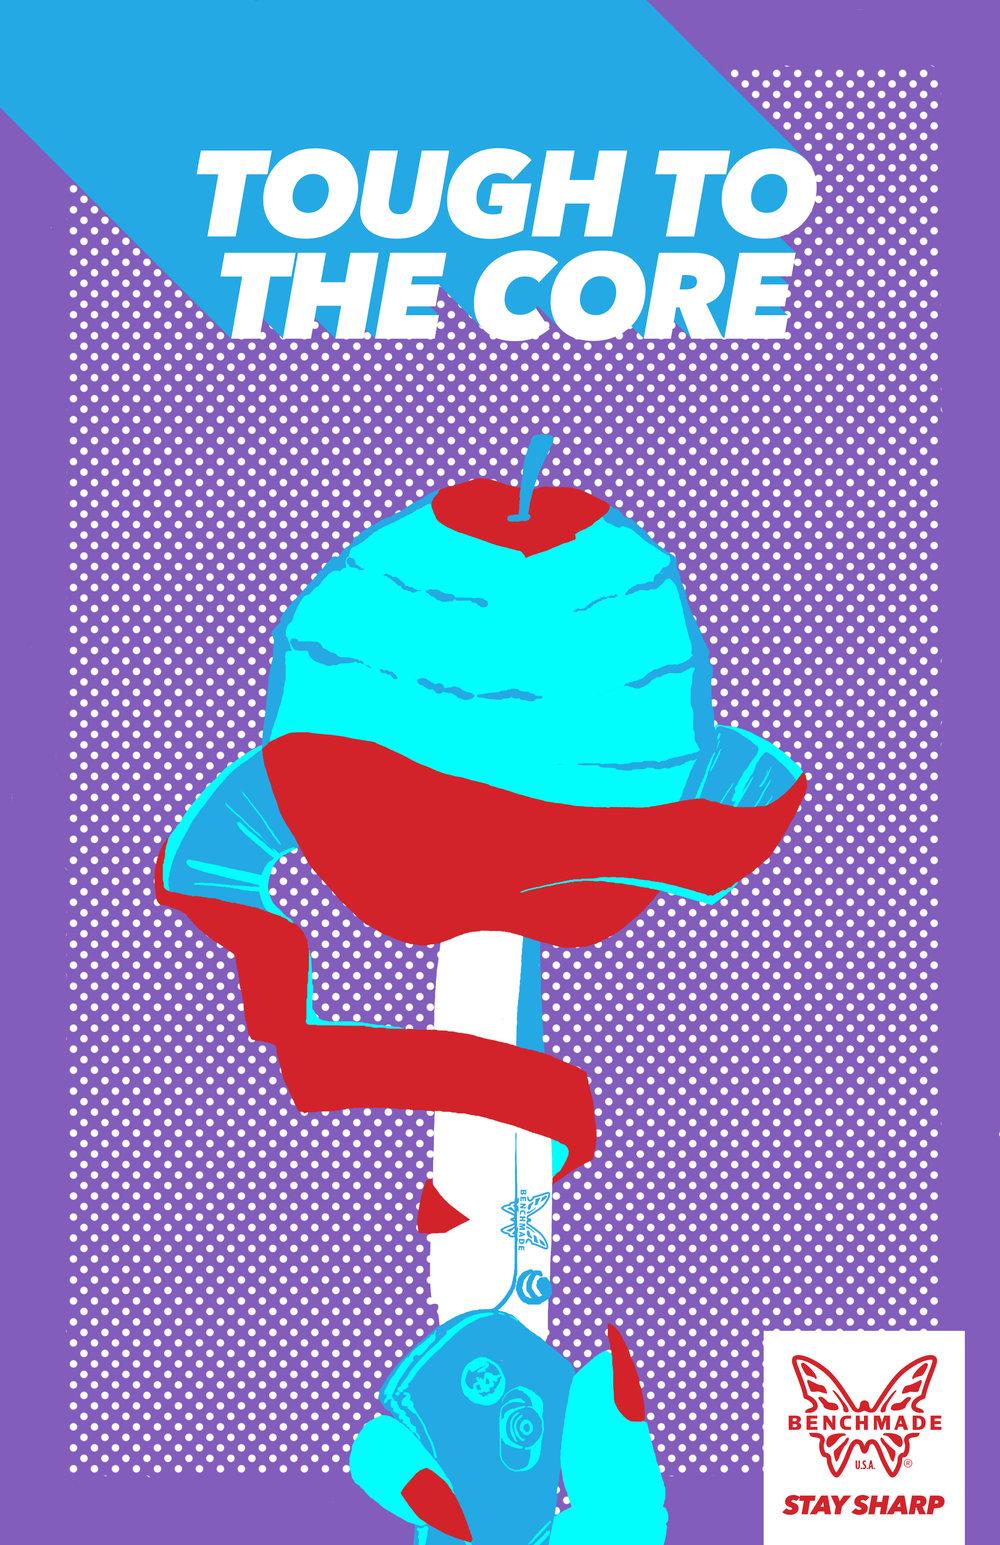 Benchmade_Poster1.jpg